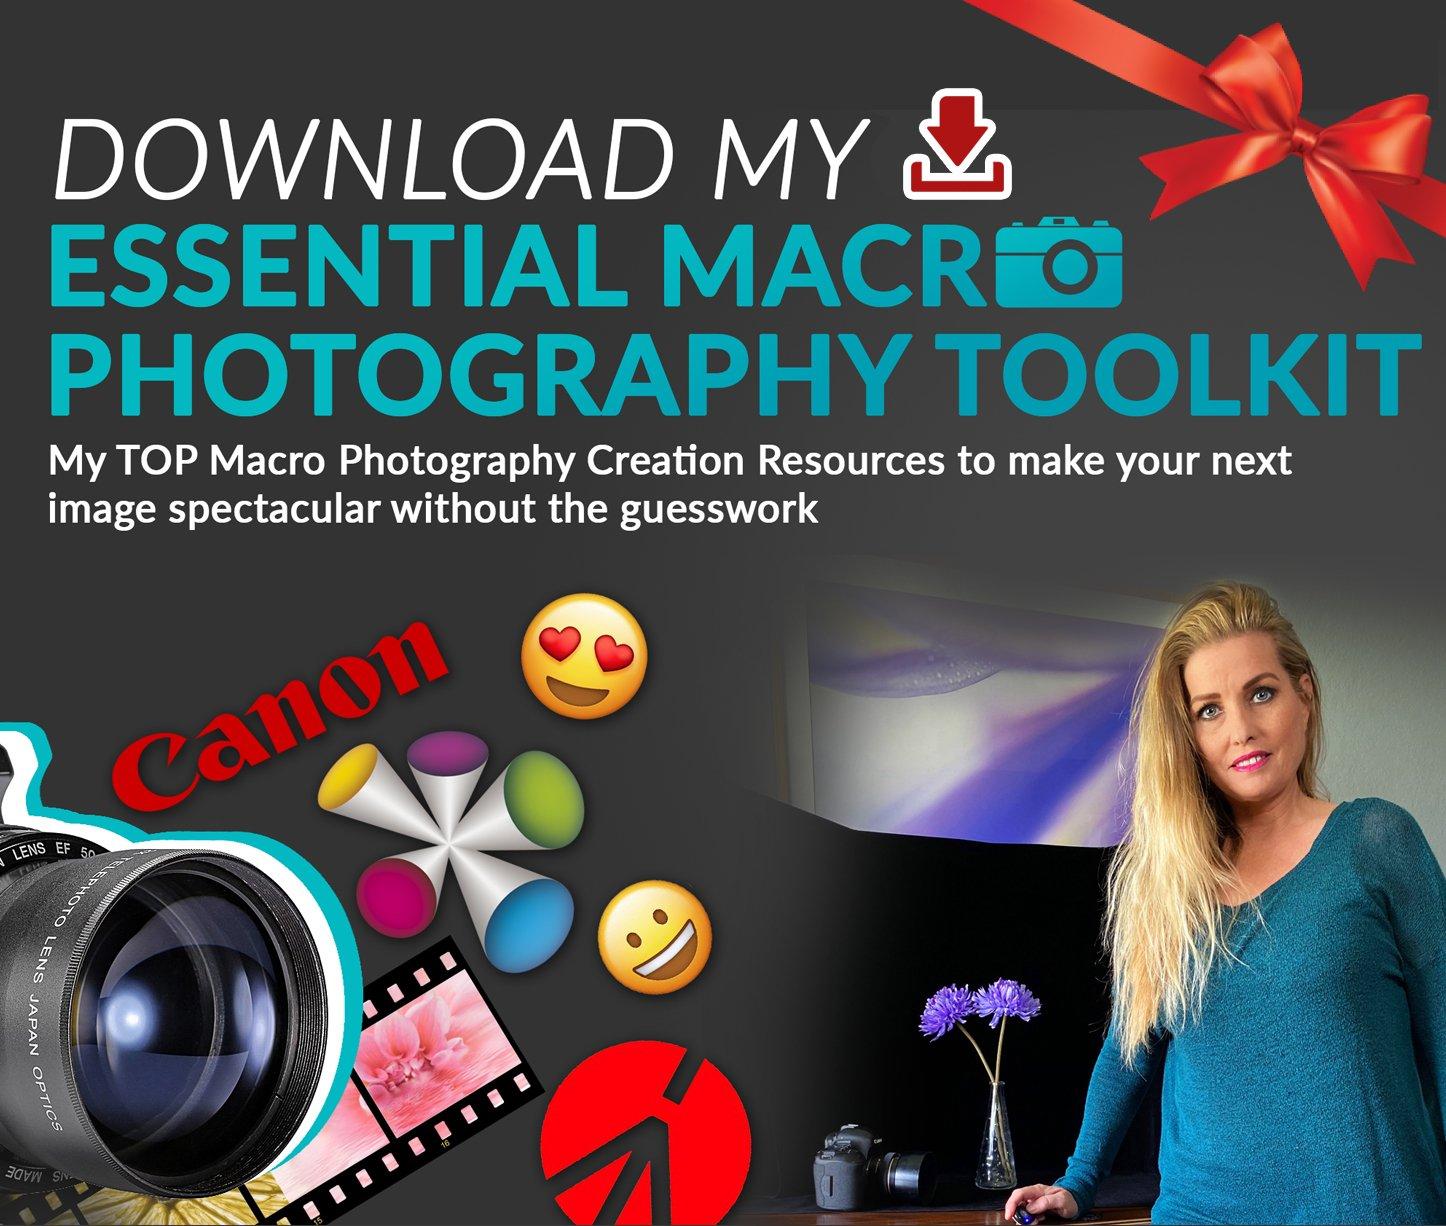 dowload macro photography toolkit here